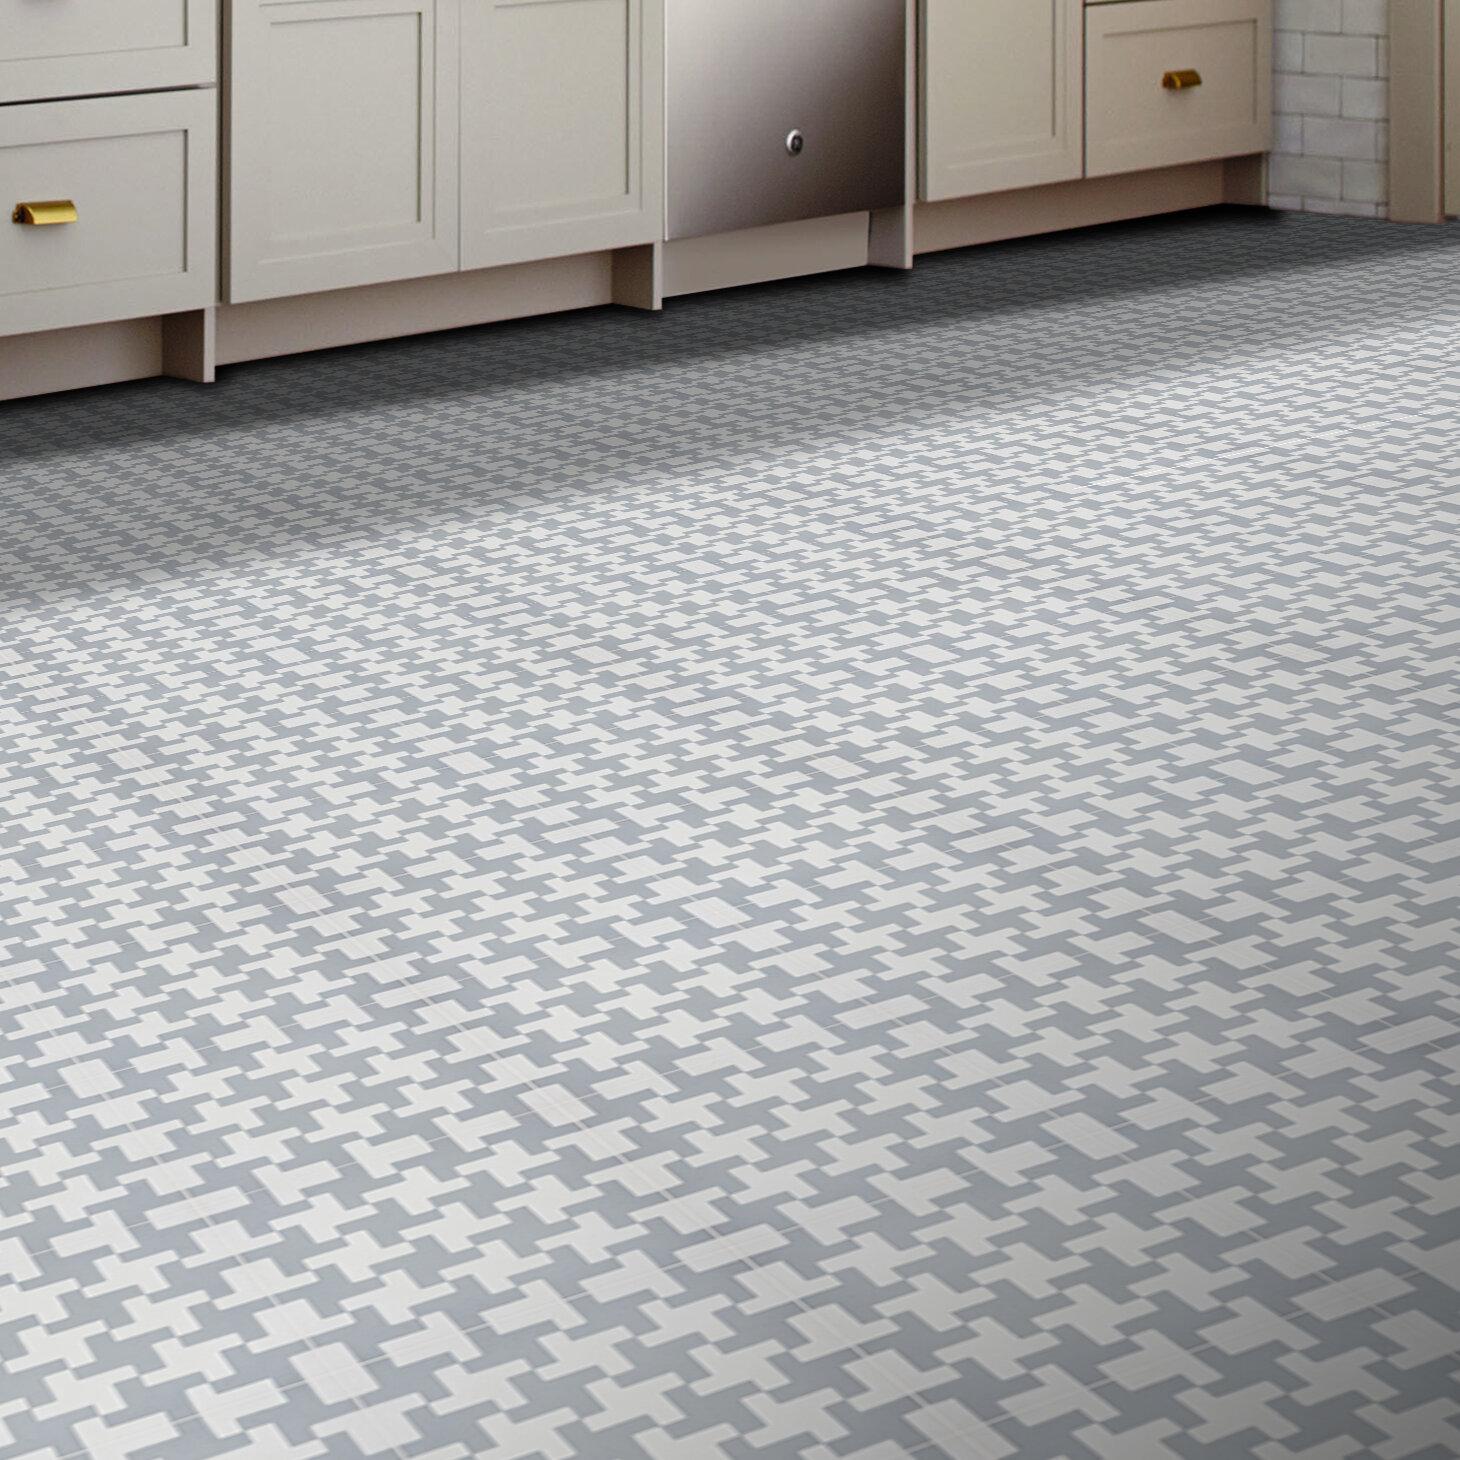 Moroccan Mosaic Tile House Souss 8 X 8 Cement Field Tile Wayfair